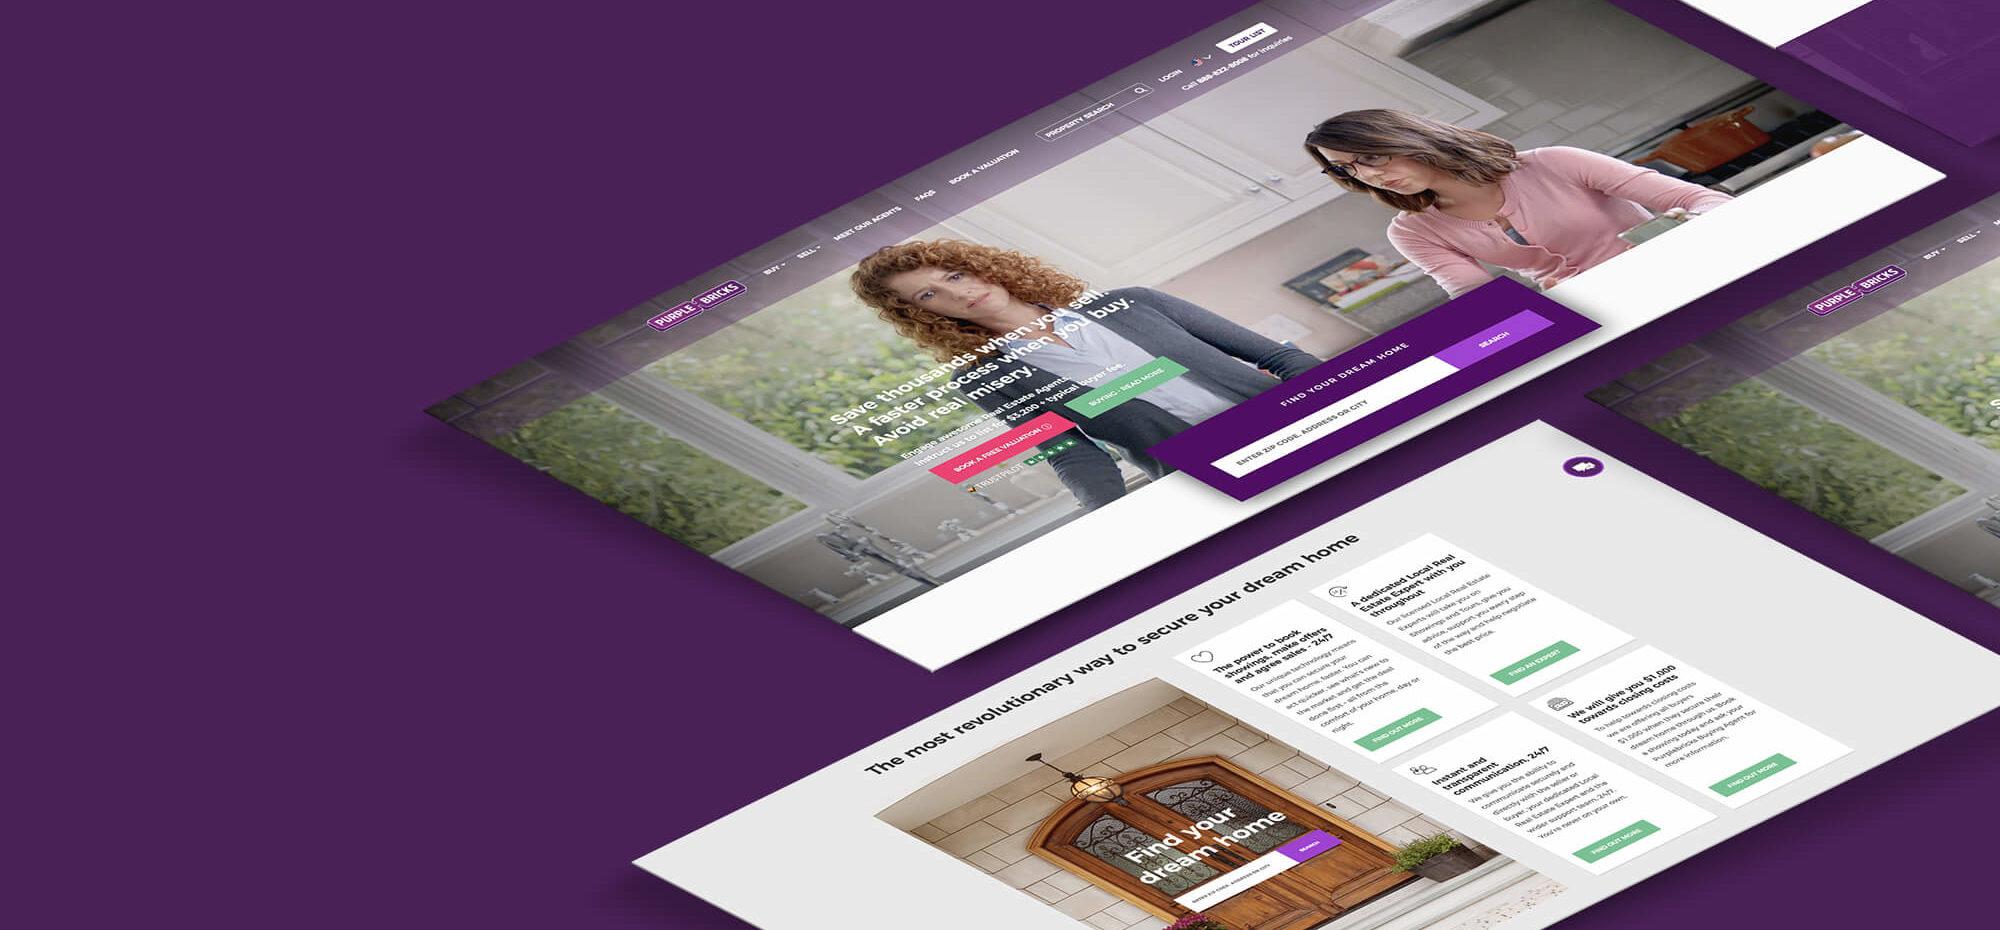 production-creative-digital-agency-ux-ui-purple-bricks